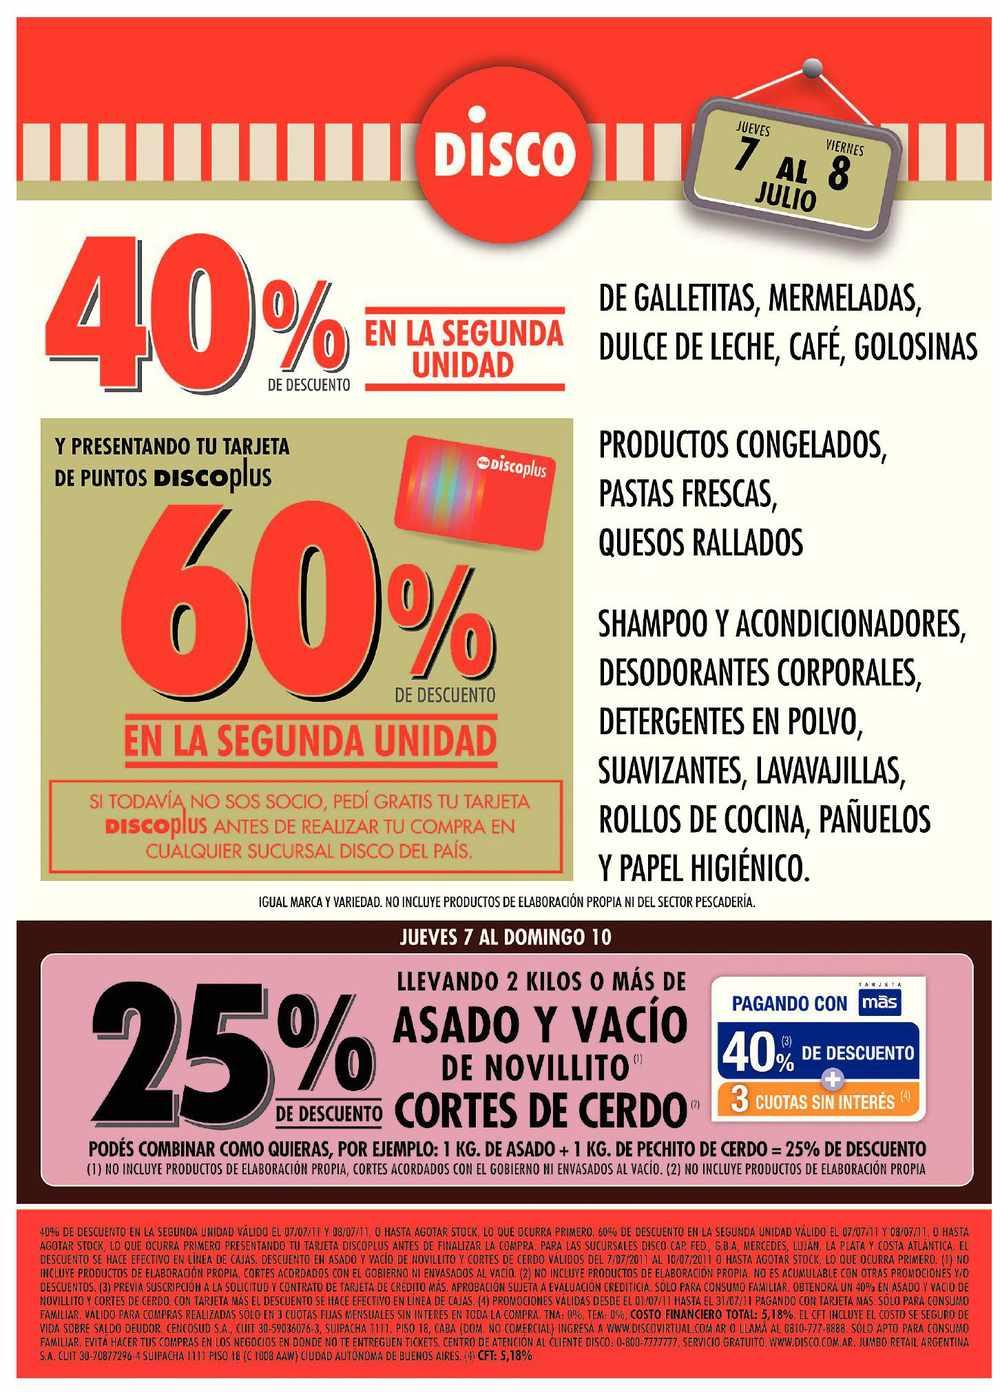 Julio 2011 s lo x hoy - Catalogo de ofertas de merkamueble ...